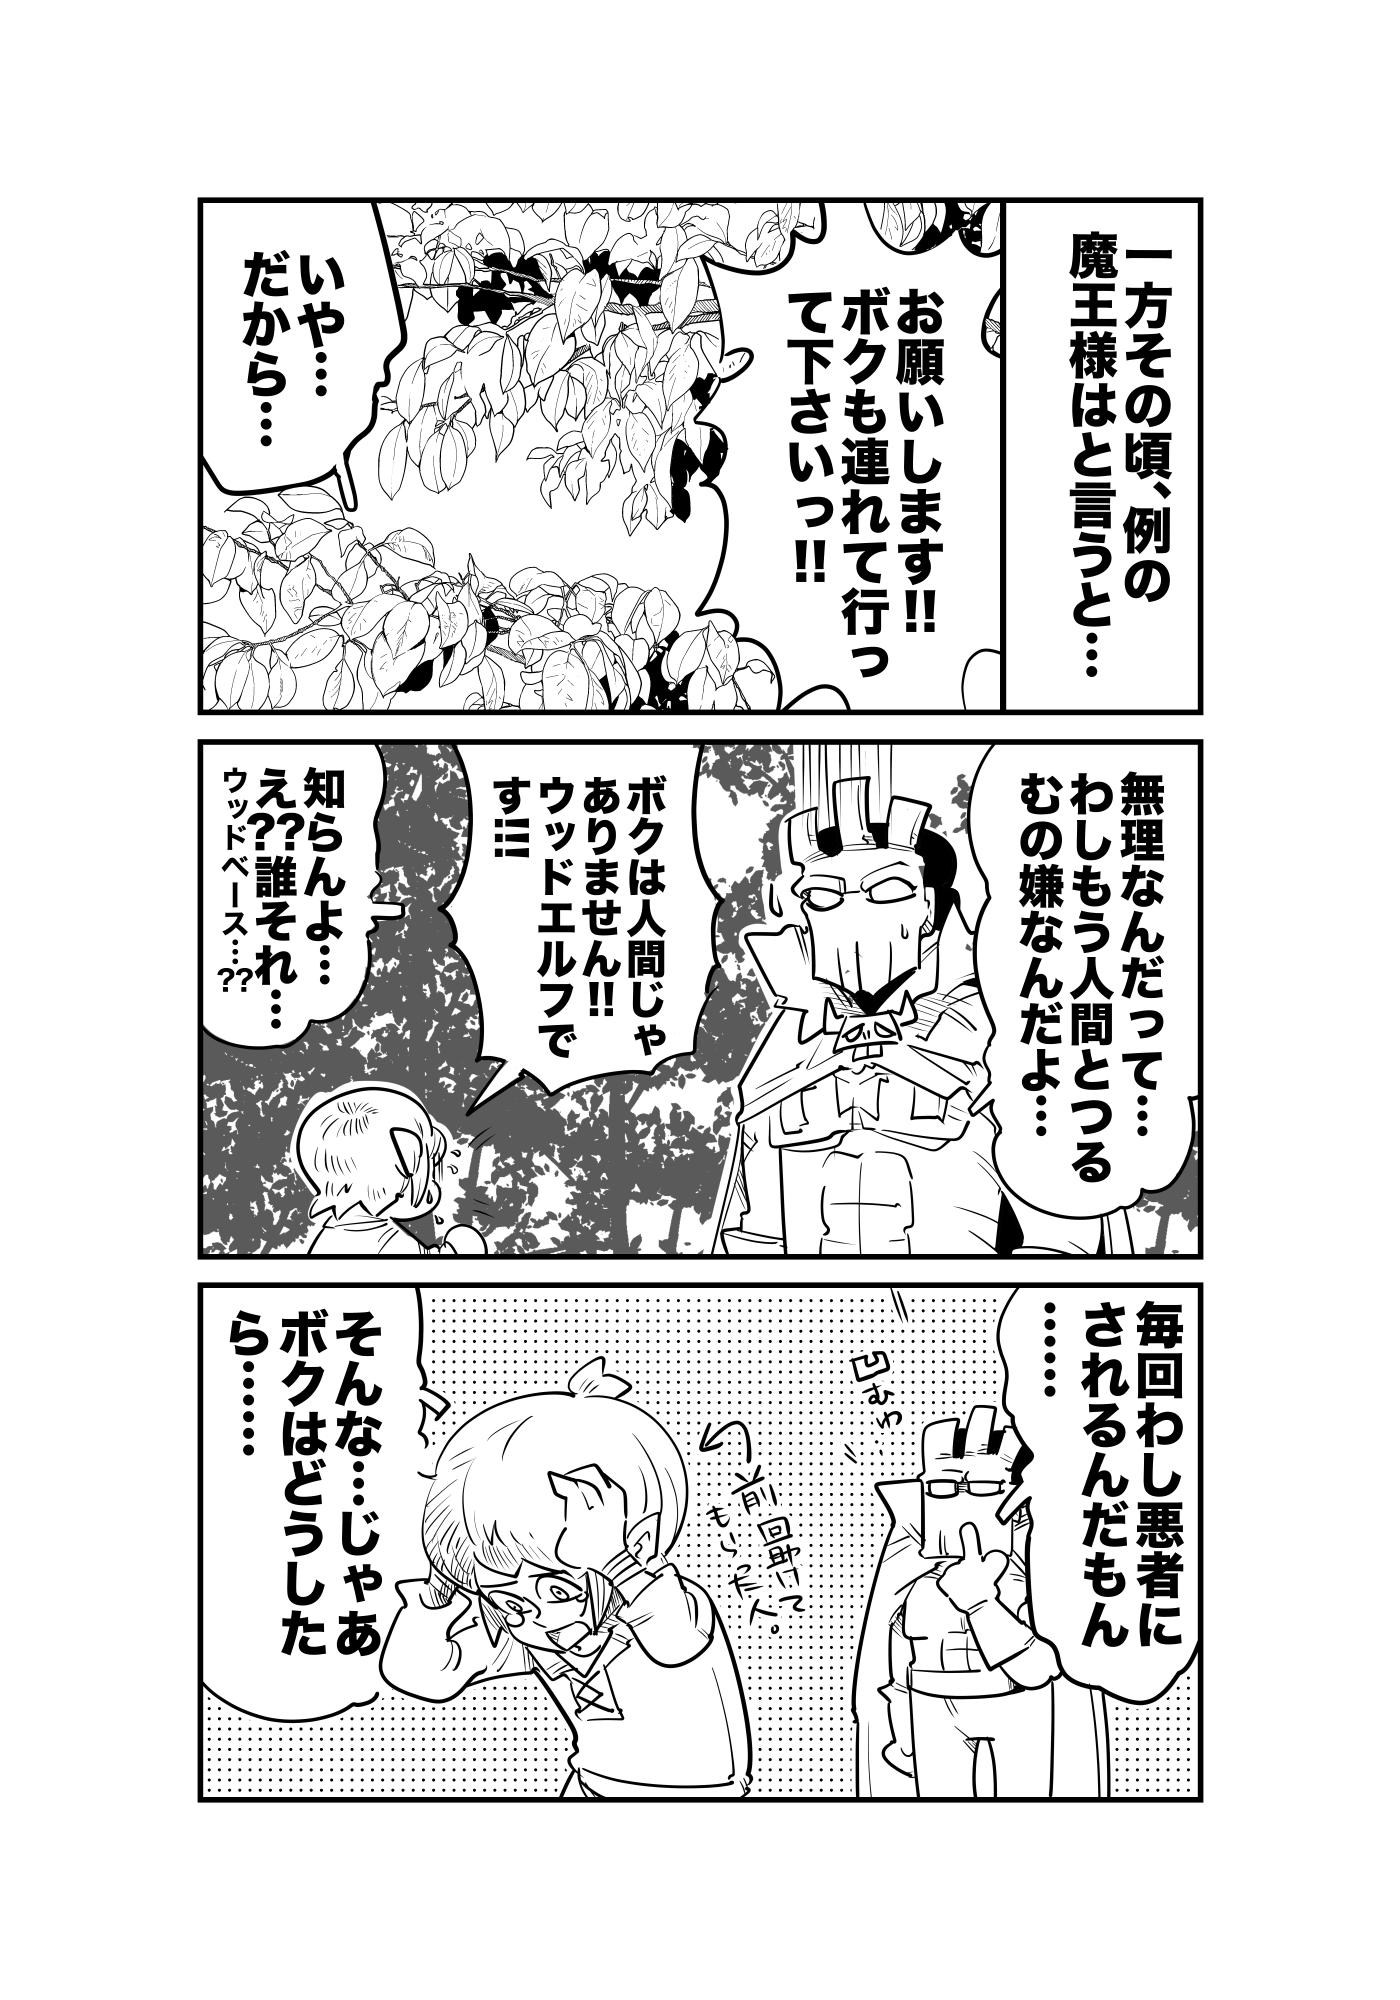 f:id:terashimaru117:20210914225723p:plain